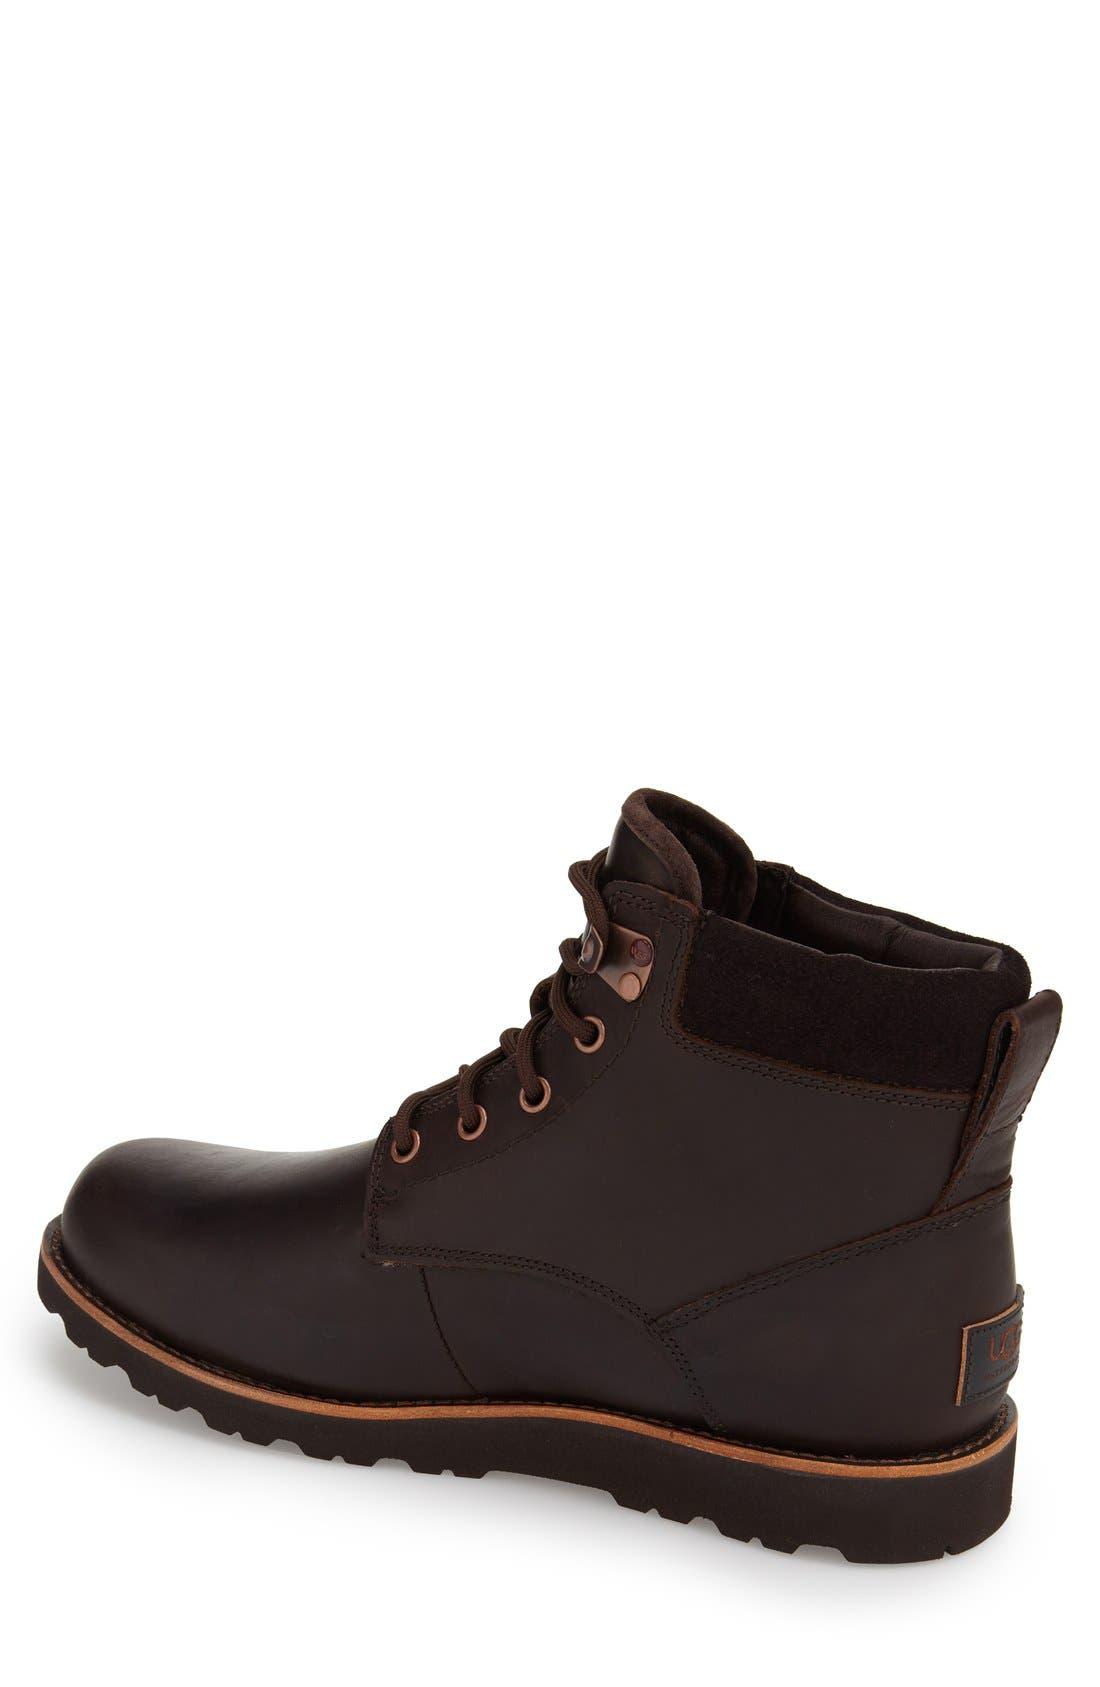 Alternate Image 2  - UGG®Seton Waterproof Chukka Boot (Men)